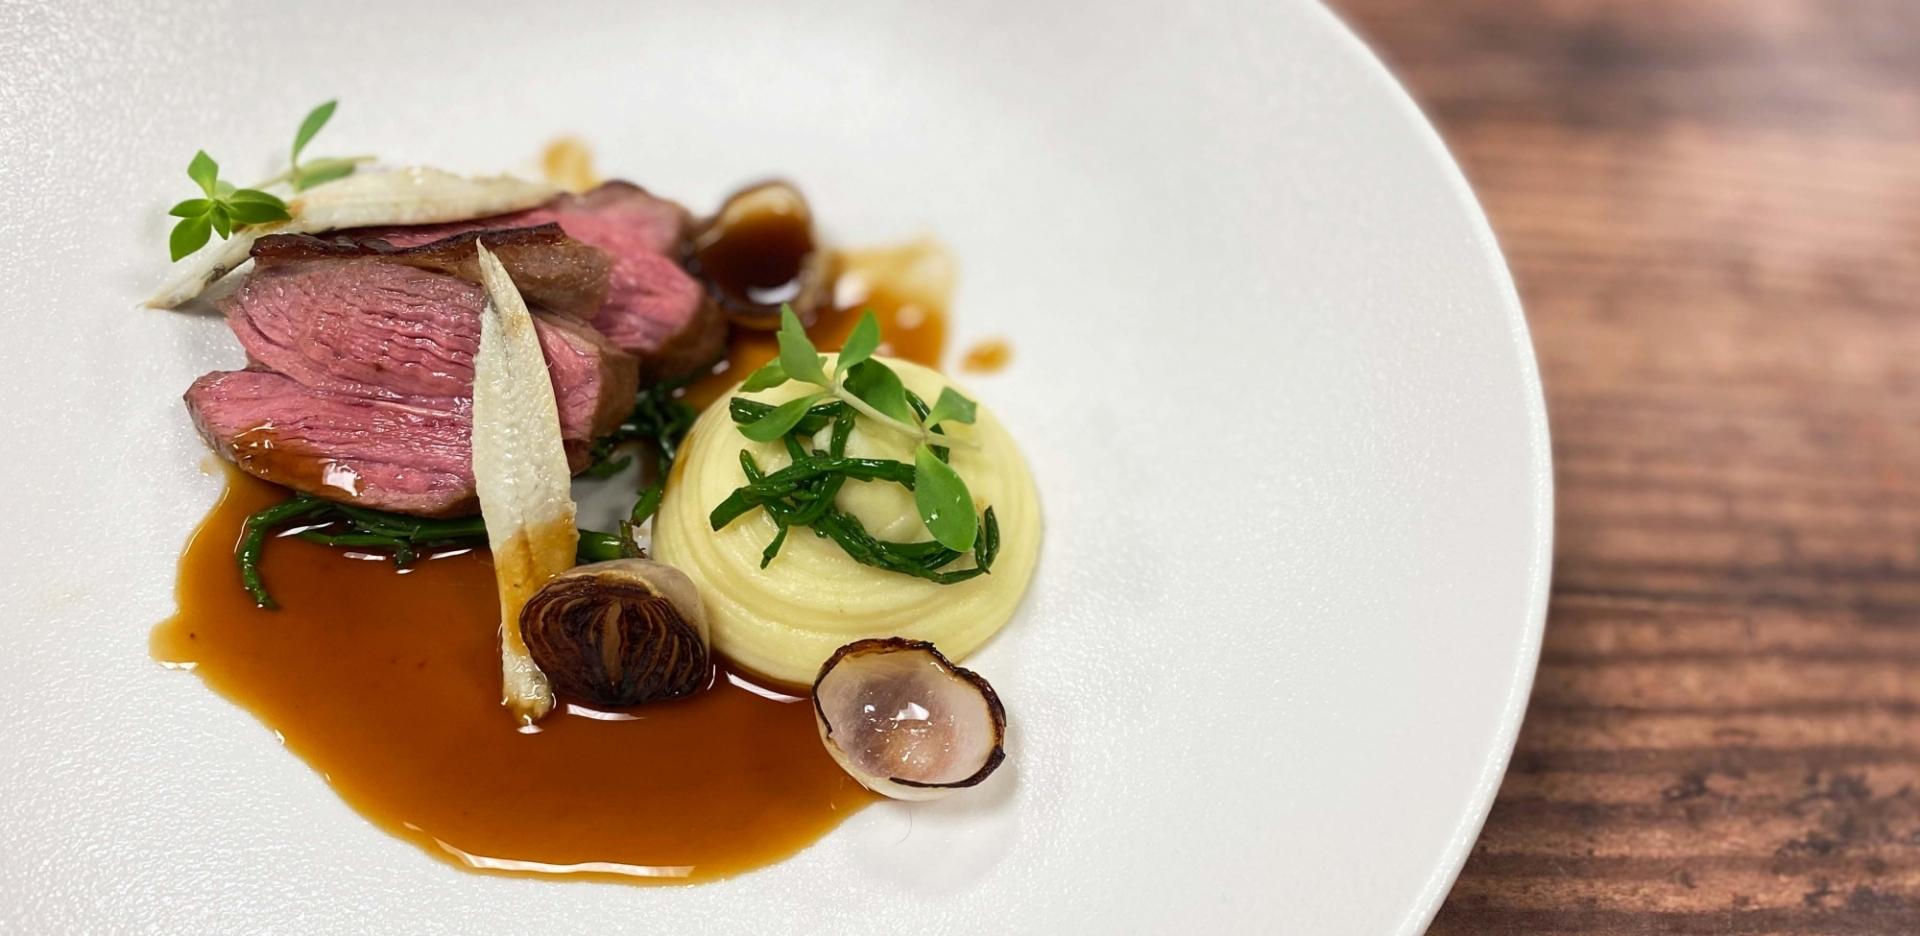 Romney Marsh Lamb Rump, Pomme Puree, Samphire and Anchovies